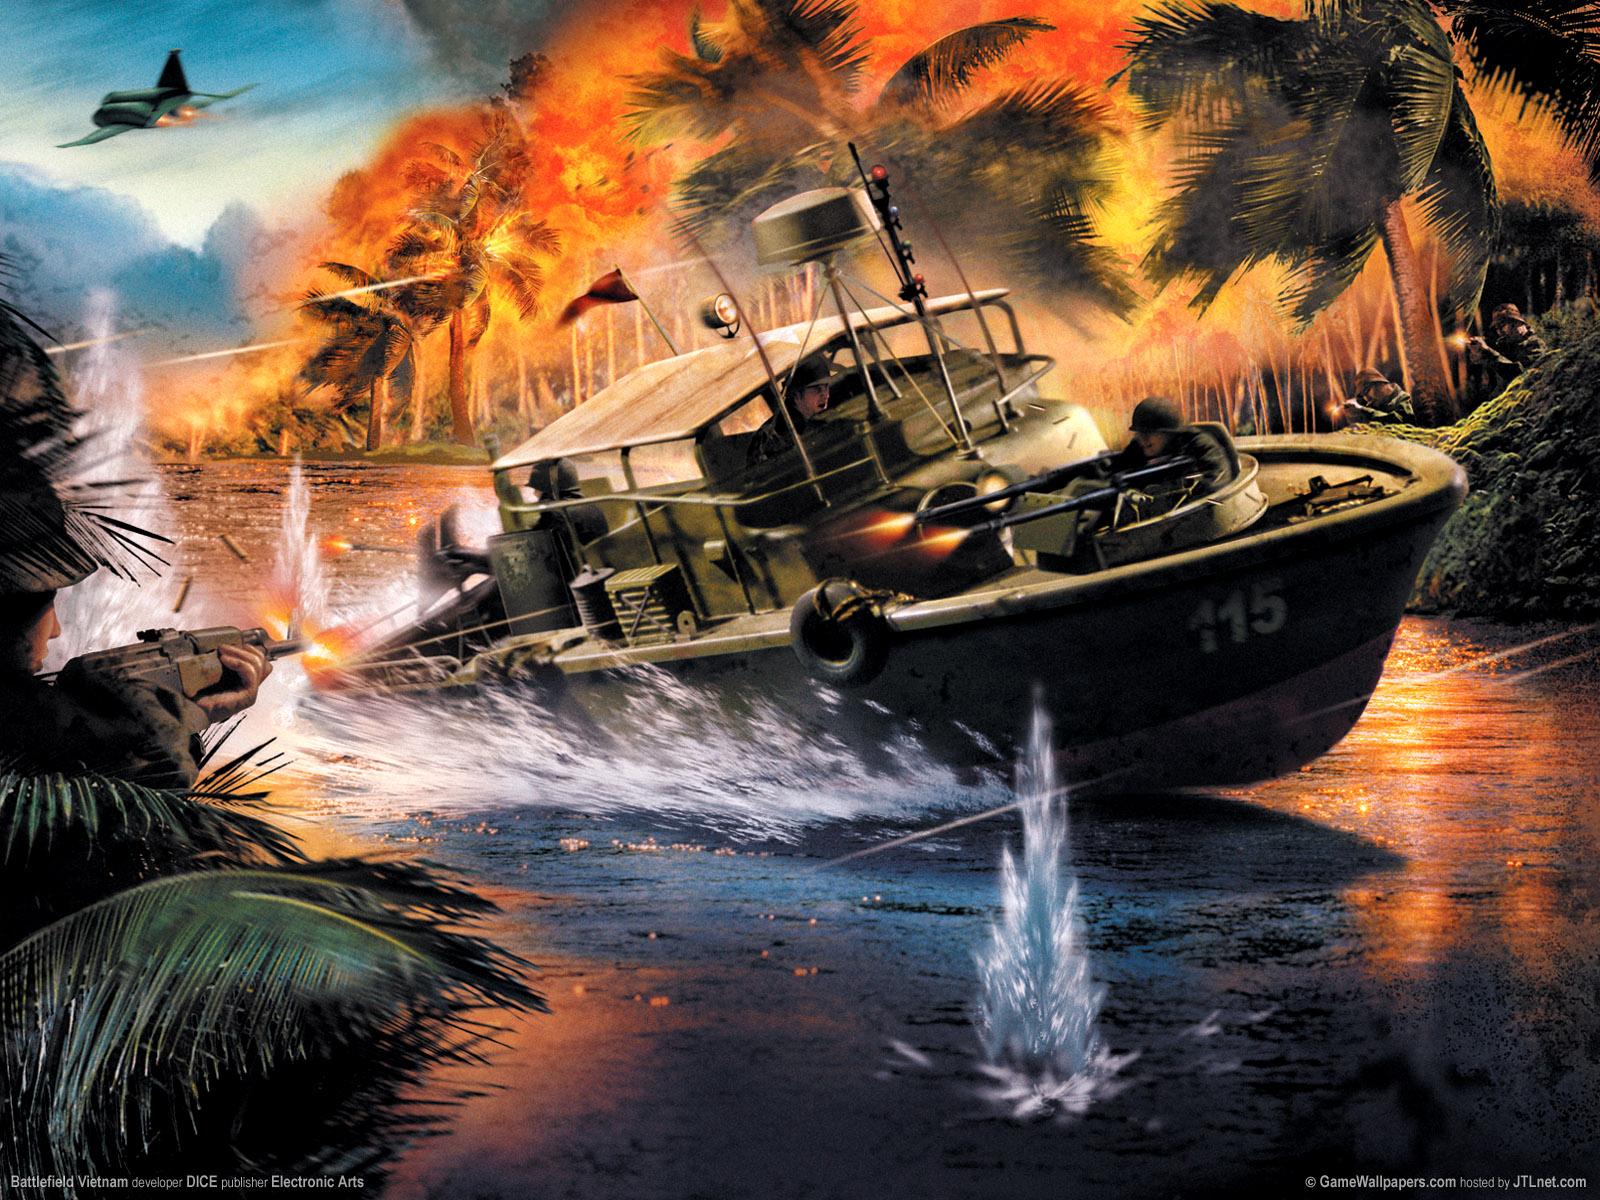 1600x1200 Battlefield Vietnam desktop PC and Mac wallpaper 1600x1200